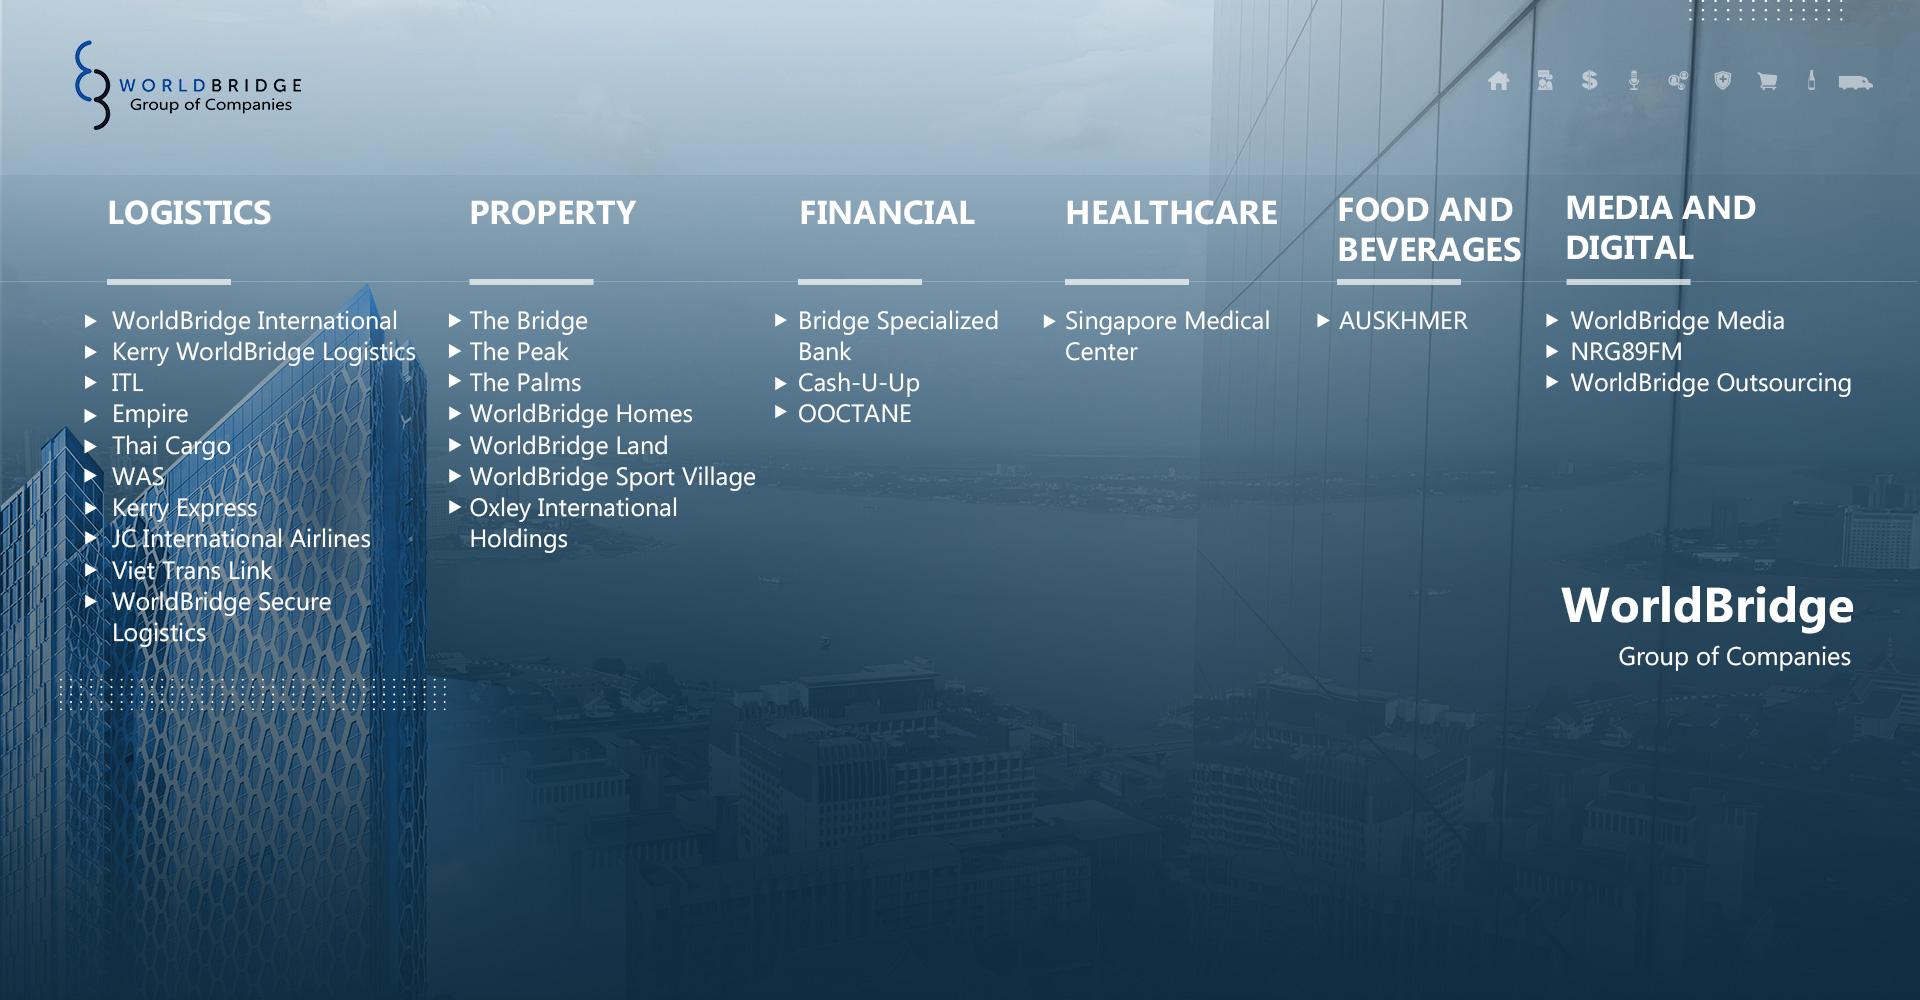 WorldBridge Group of Companies